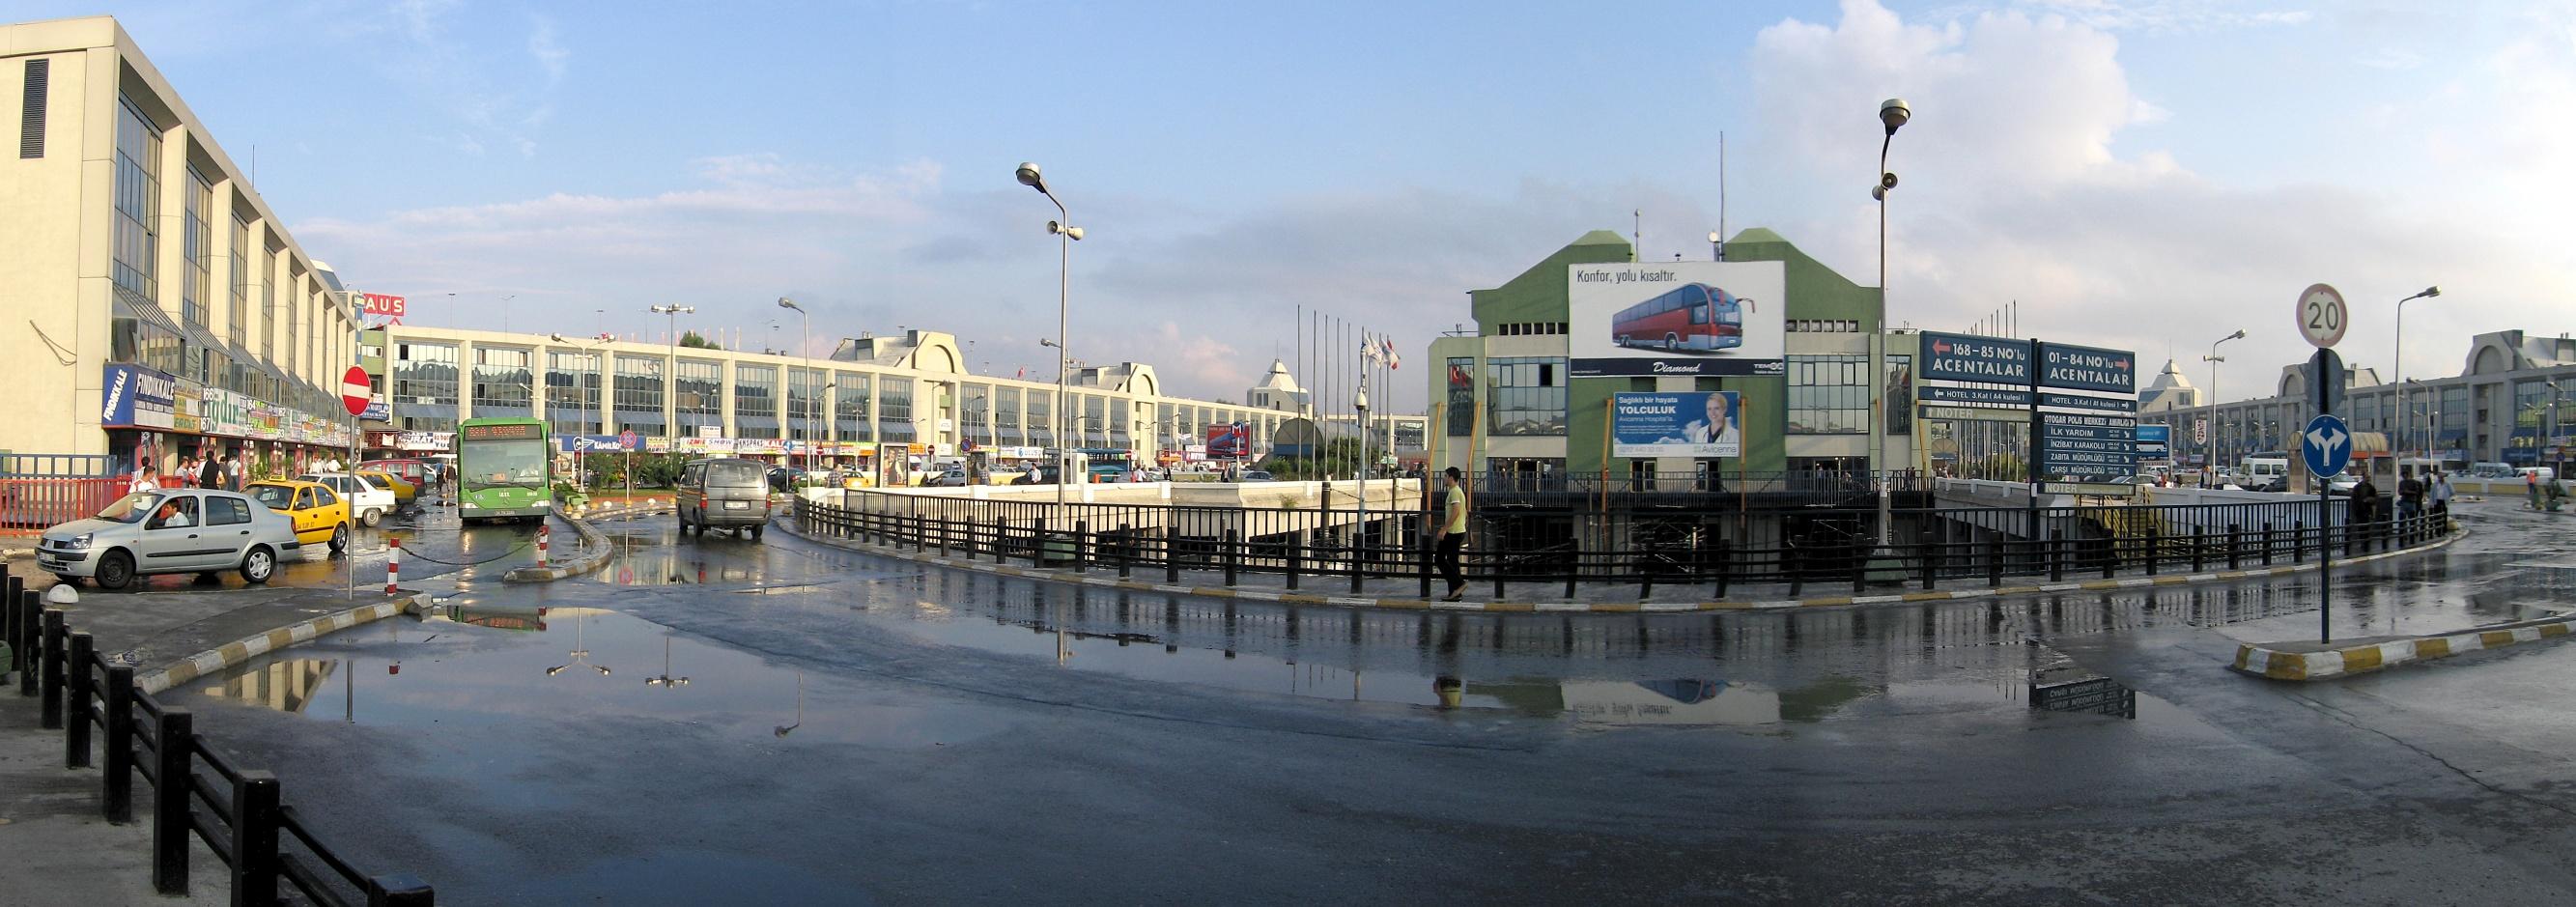 Otogar istanbul panorama.jpg